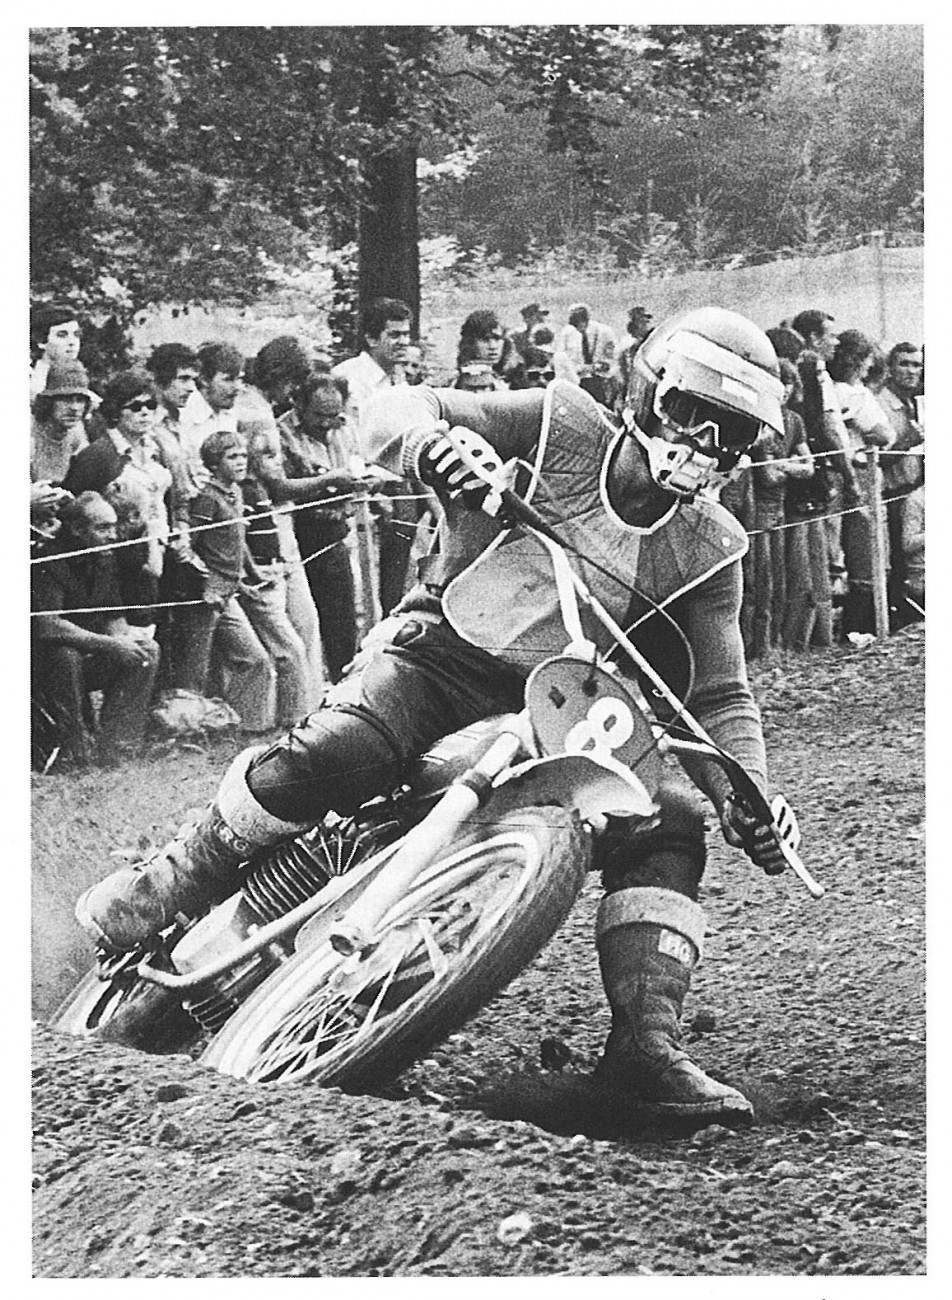 Moissev KTM MC 250 Leningrad 1974